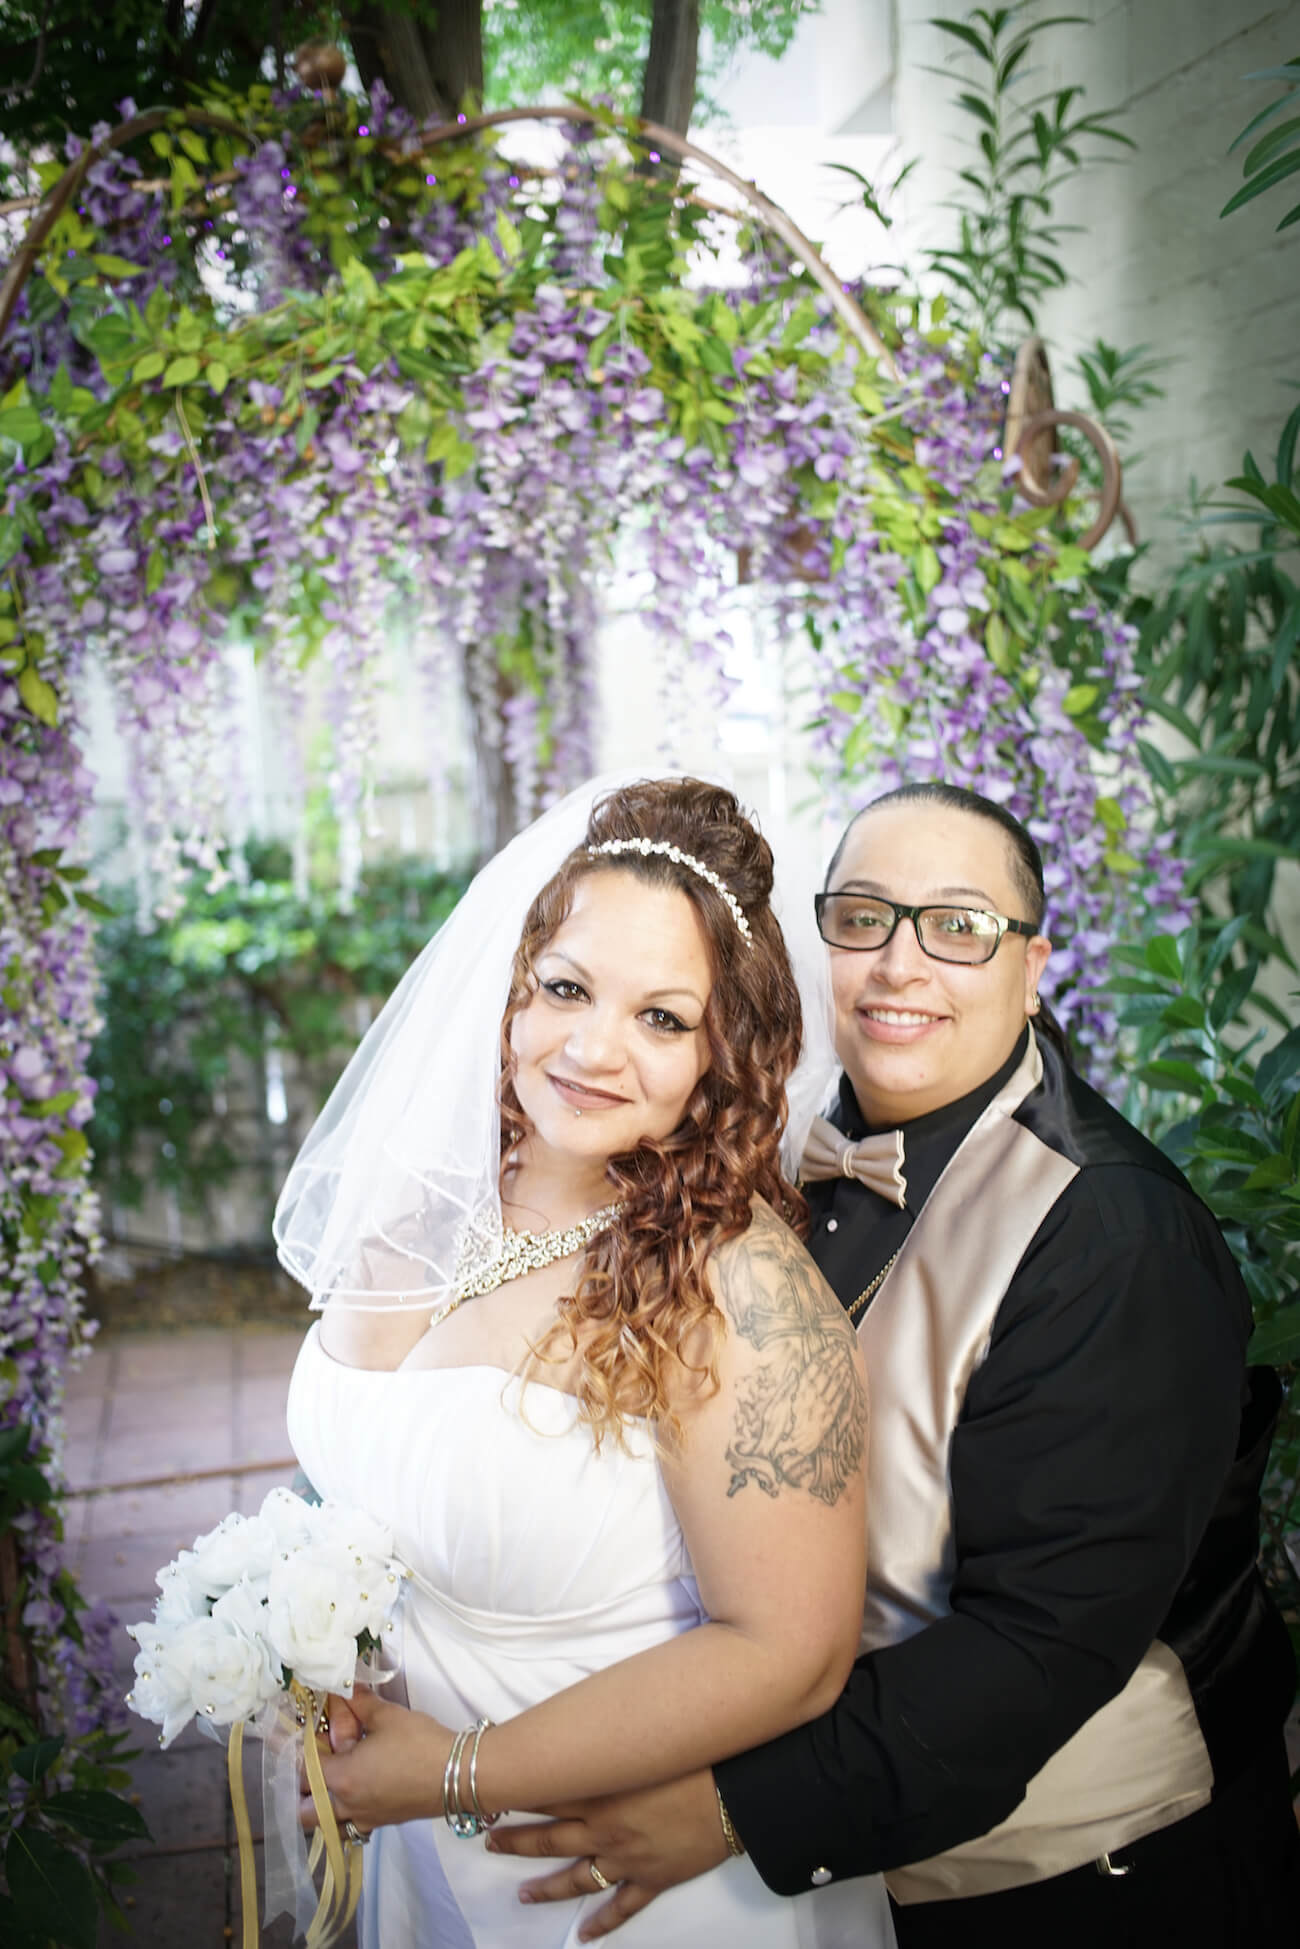 Gay Weddings Las Vegas Mon Bel Ami Wedding Chapel